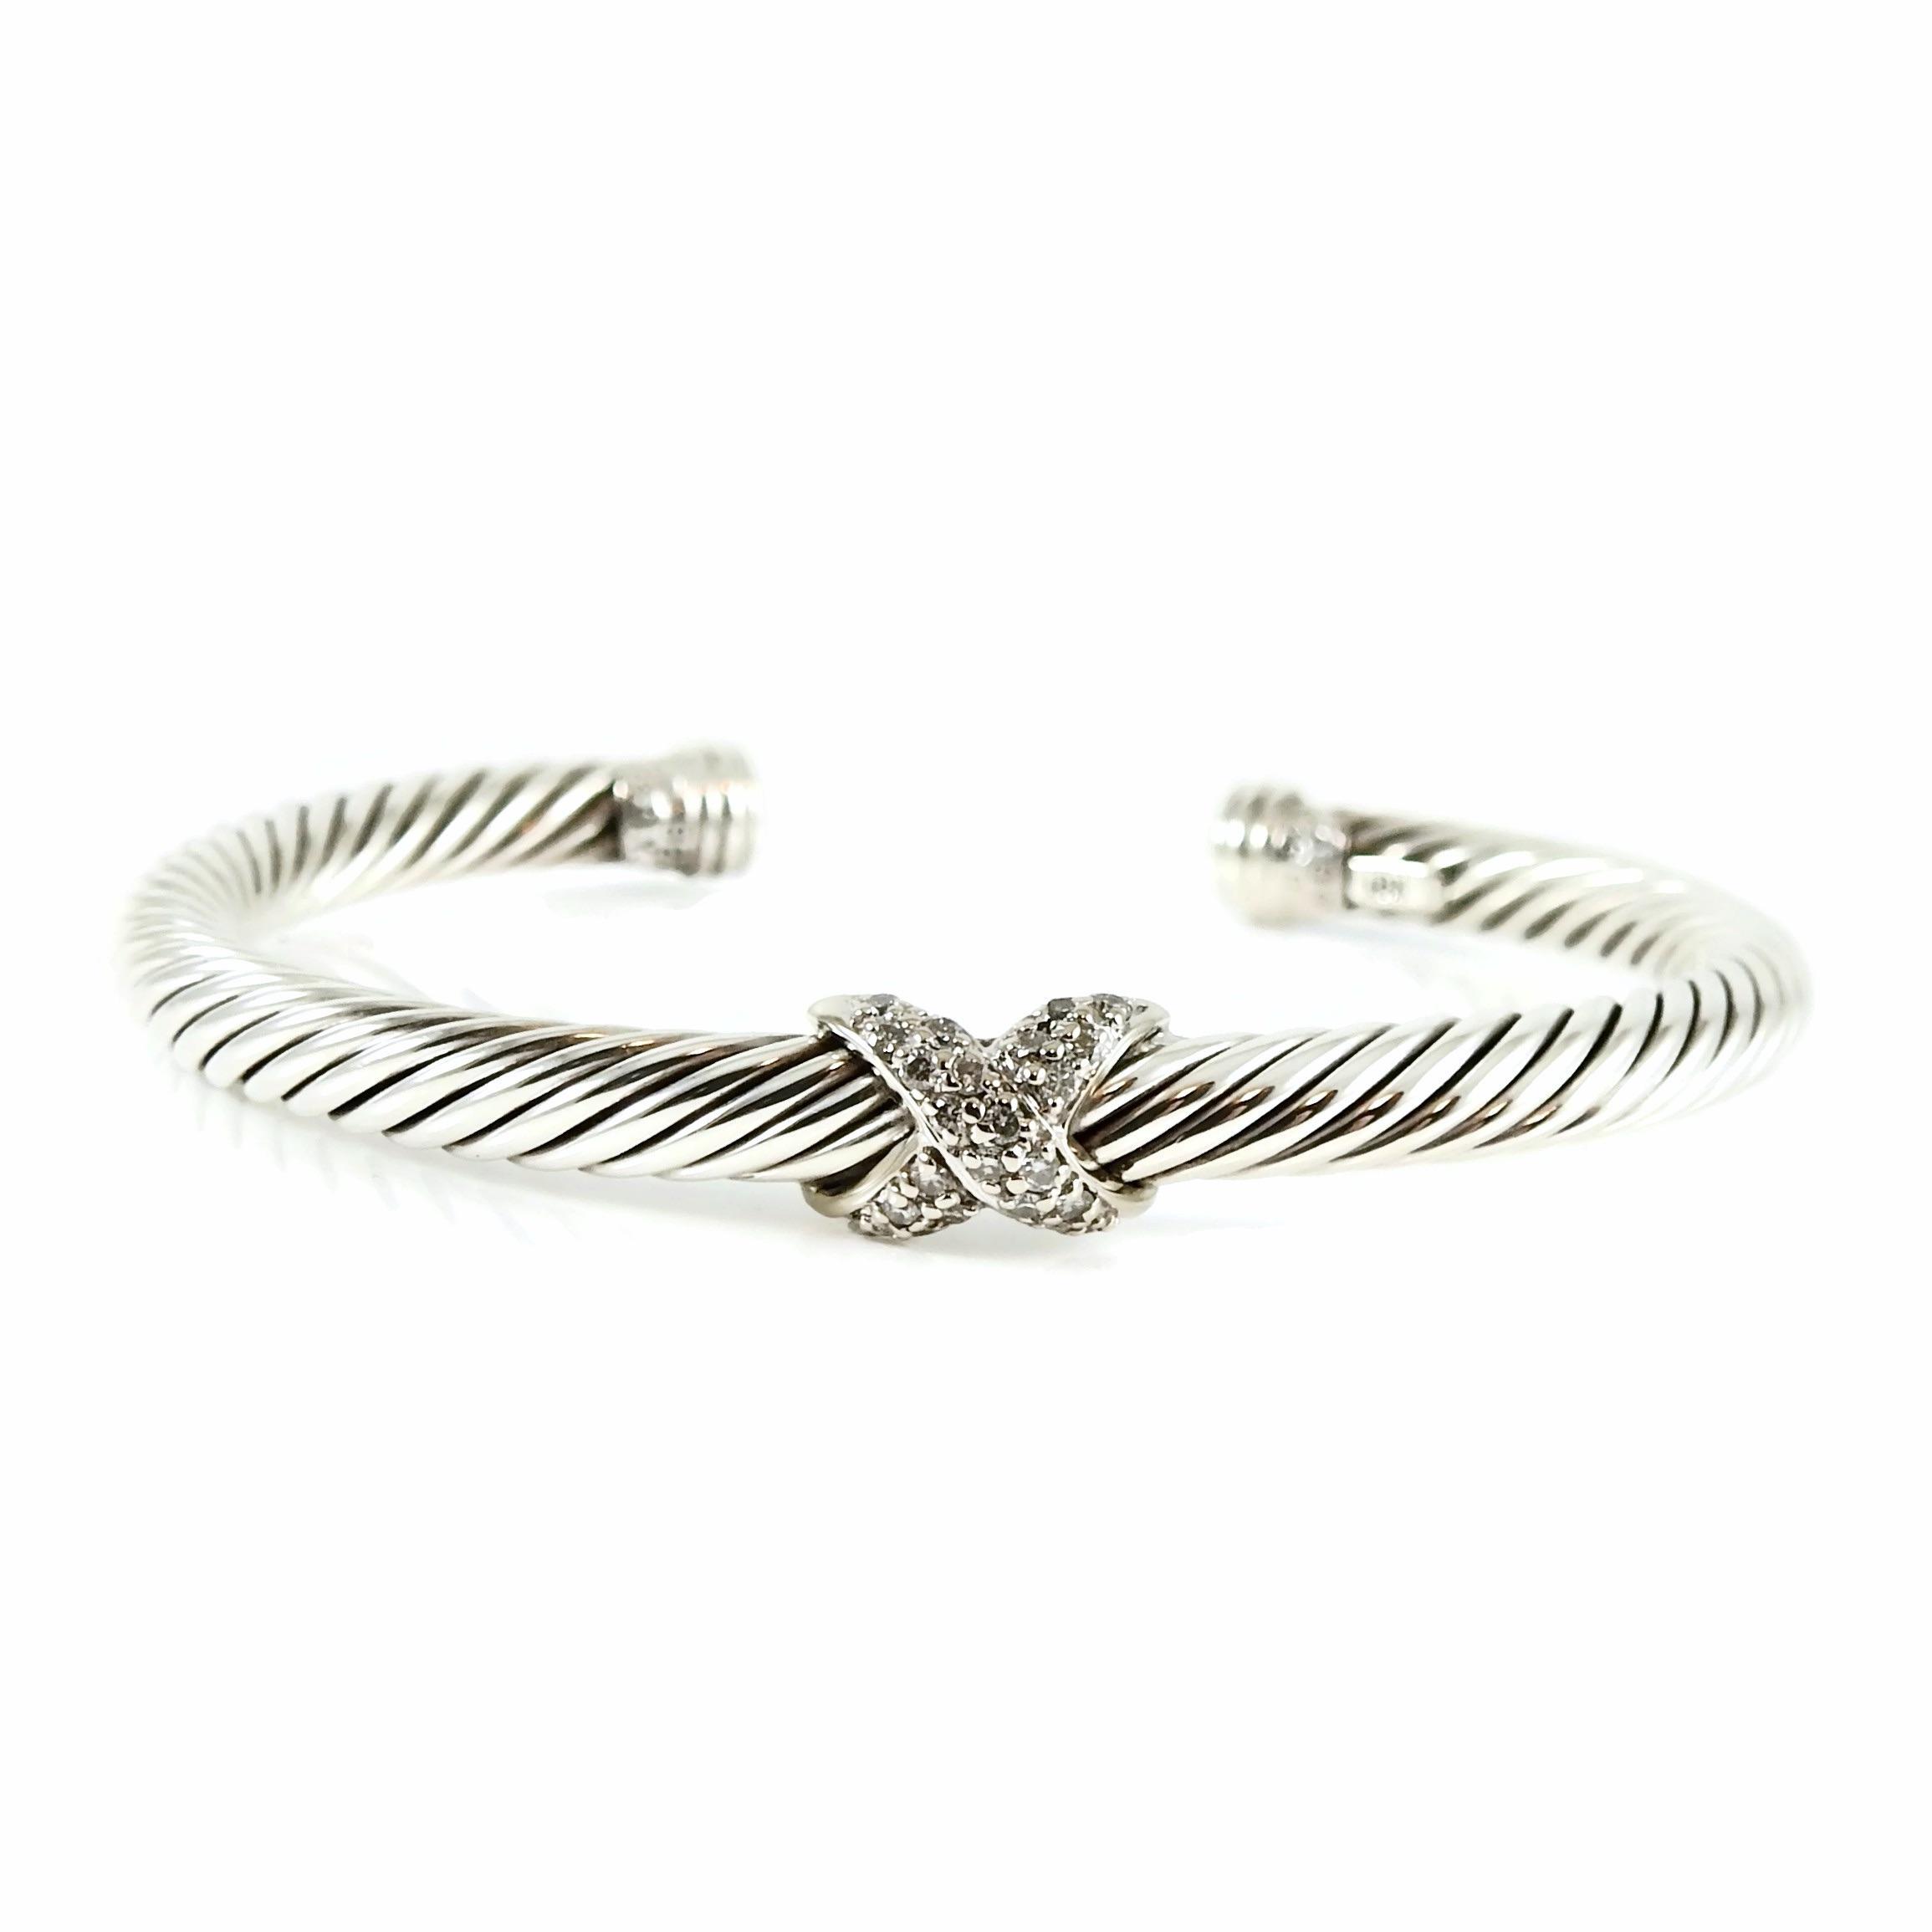 $475 David Yurman Silver 925 Renaissance Bangle Bracelet with 18k Gold Dome 4mm